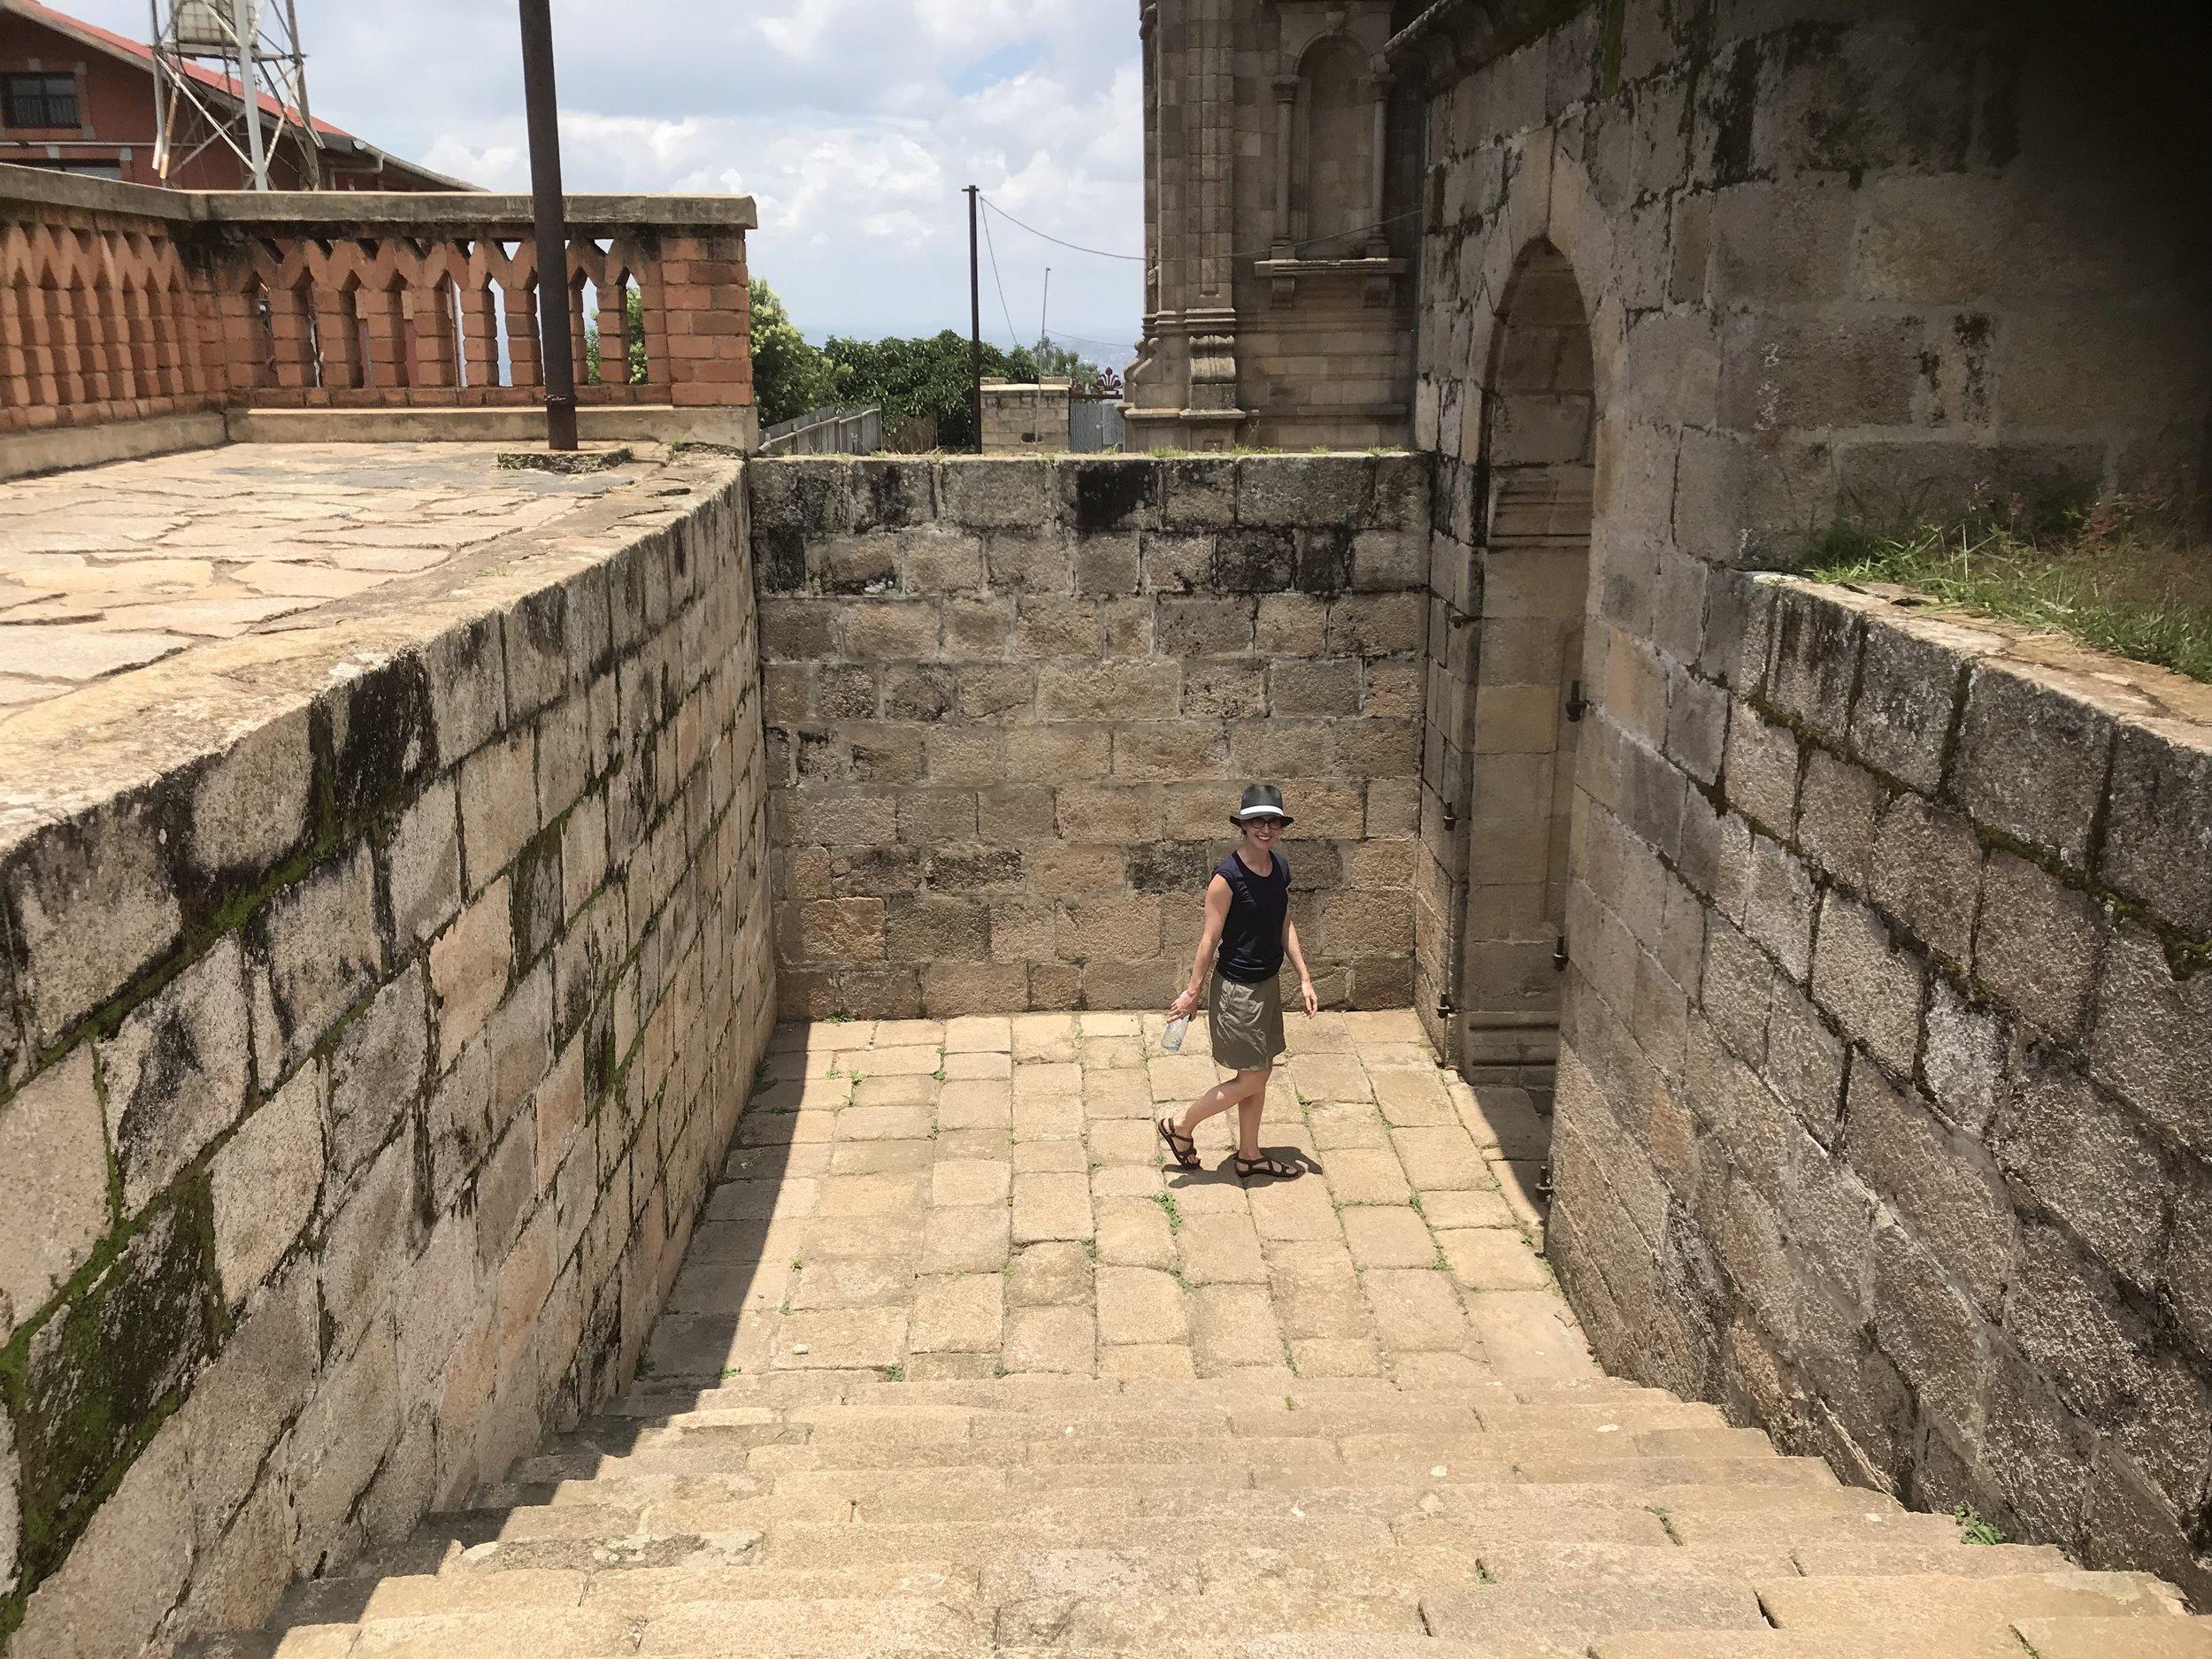 Alex admires some ancient ruins